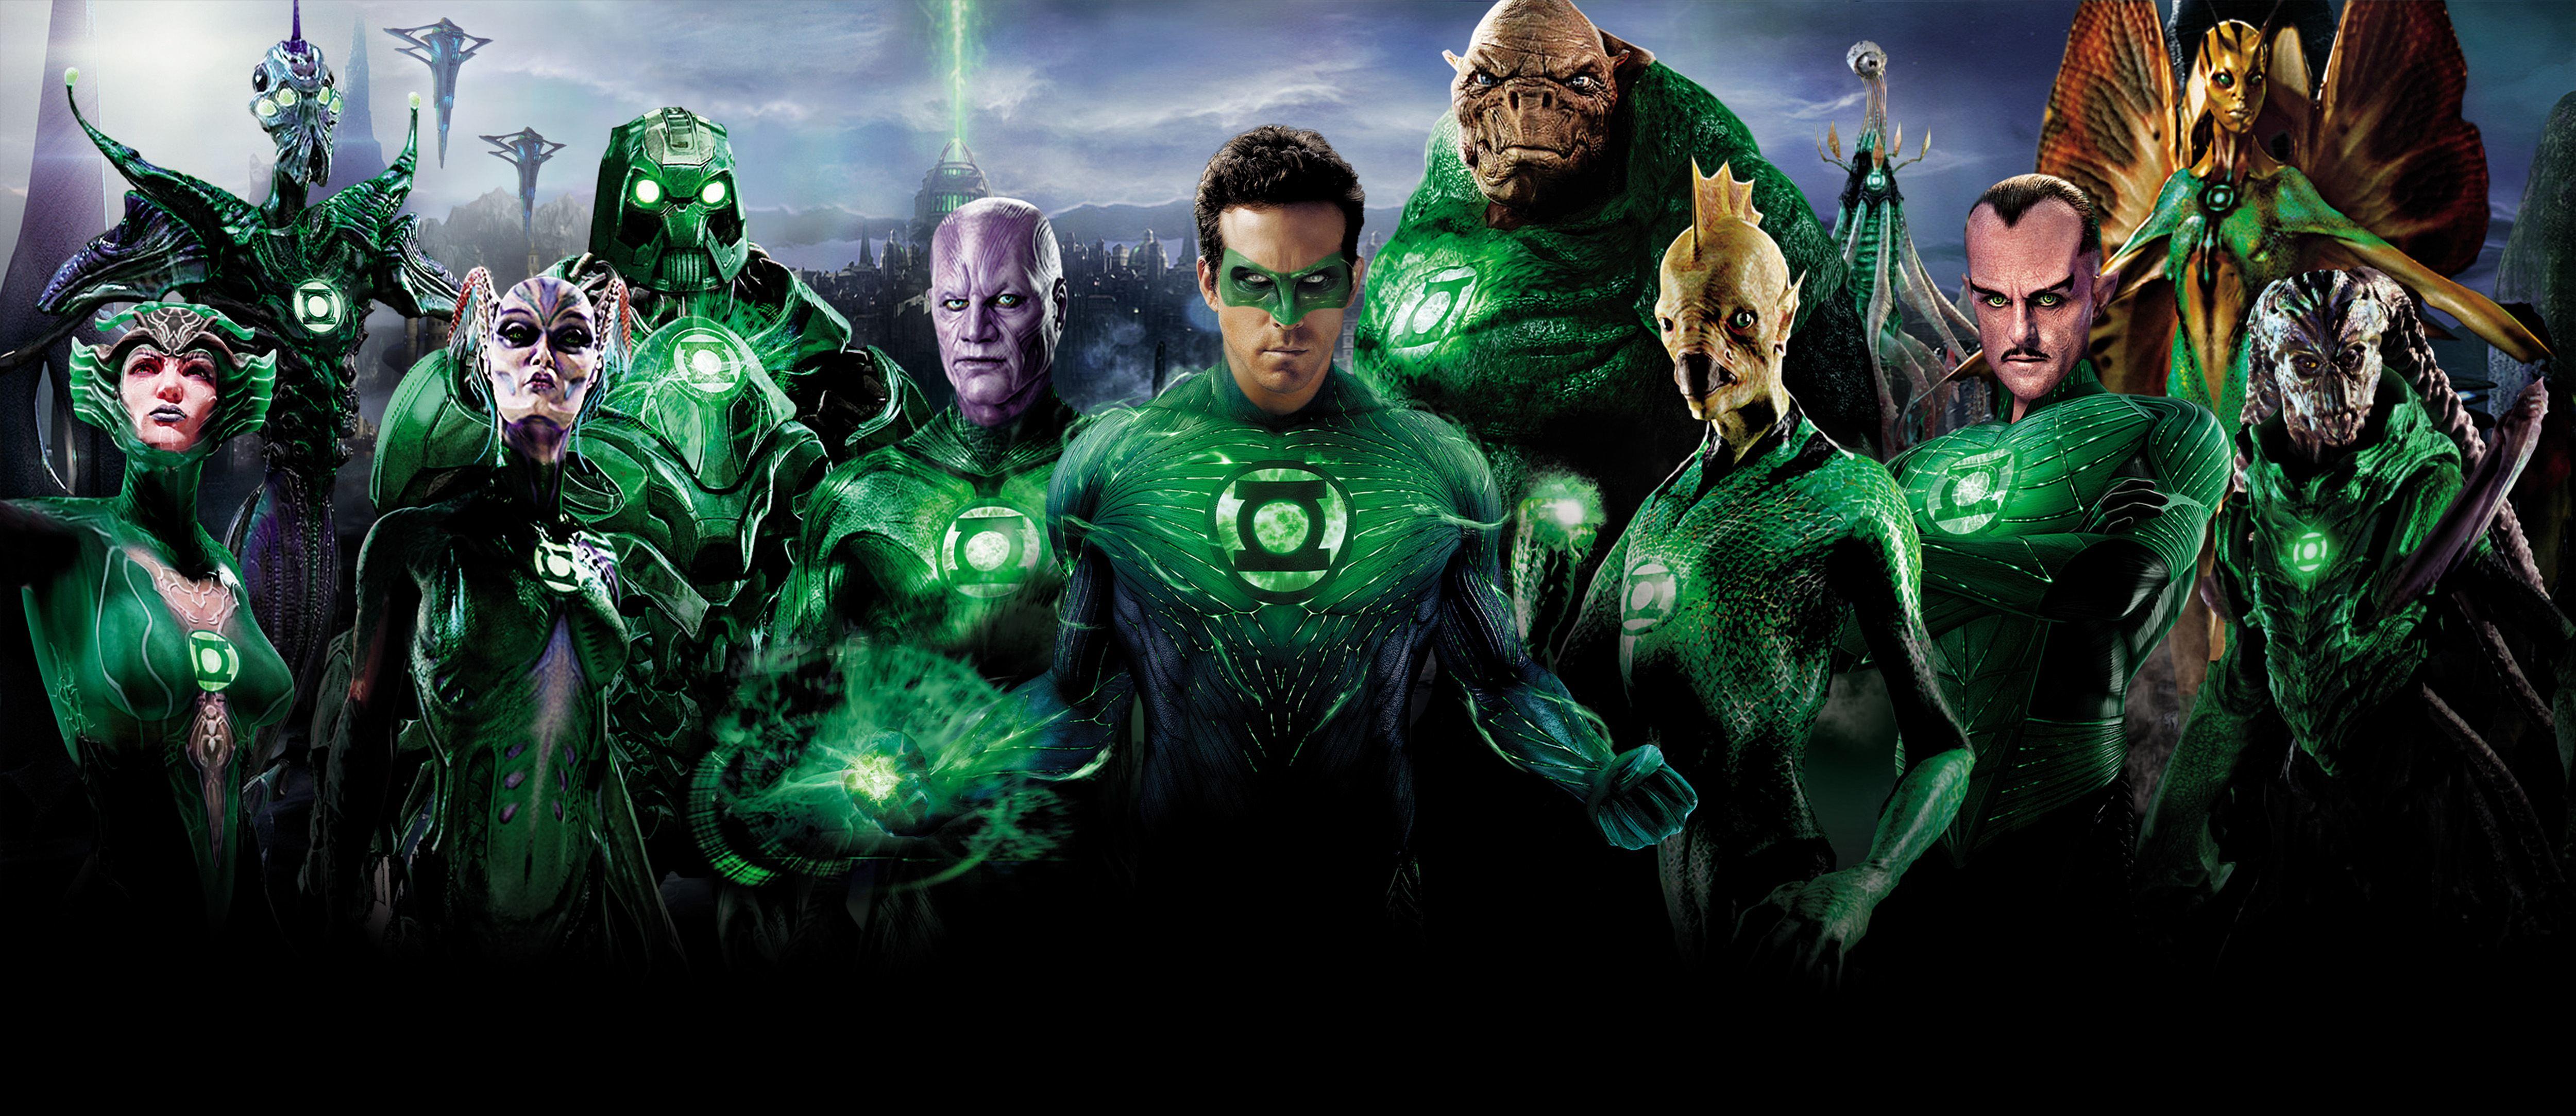 Wallpaper Movies Heroes comics Green Lantern Ryan Reynolds 5000x2167 5000x2167